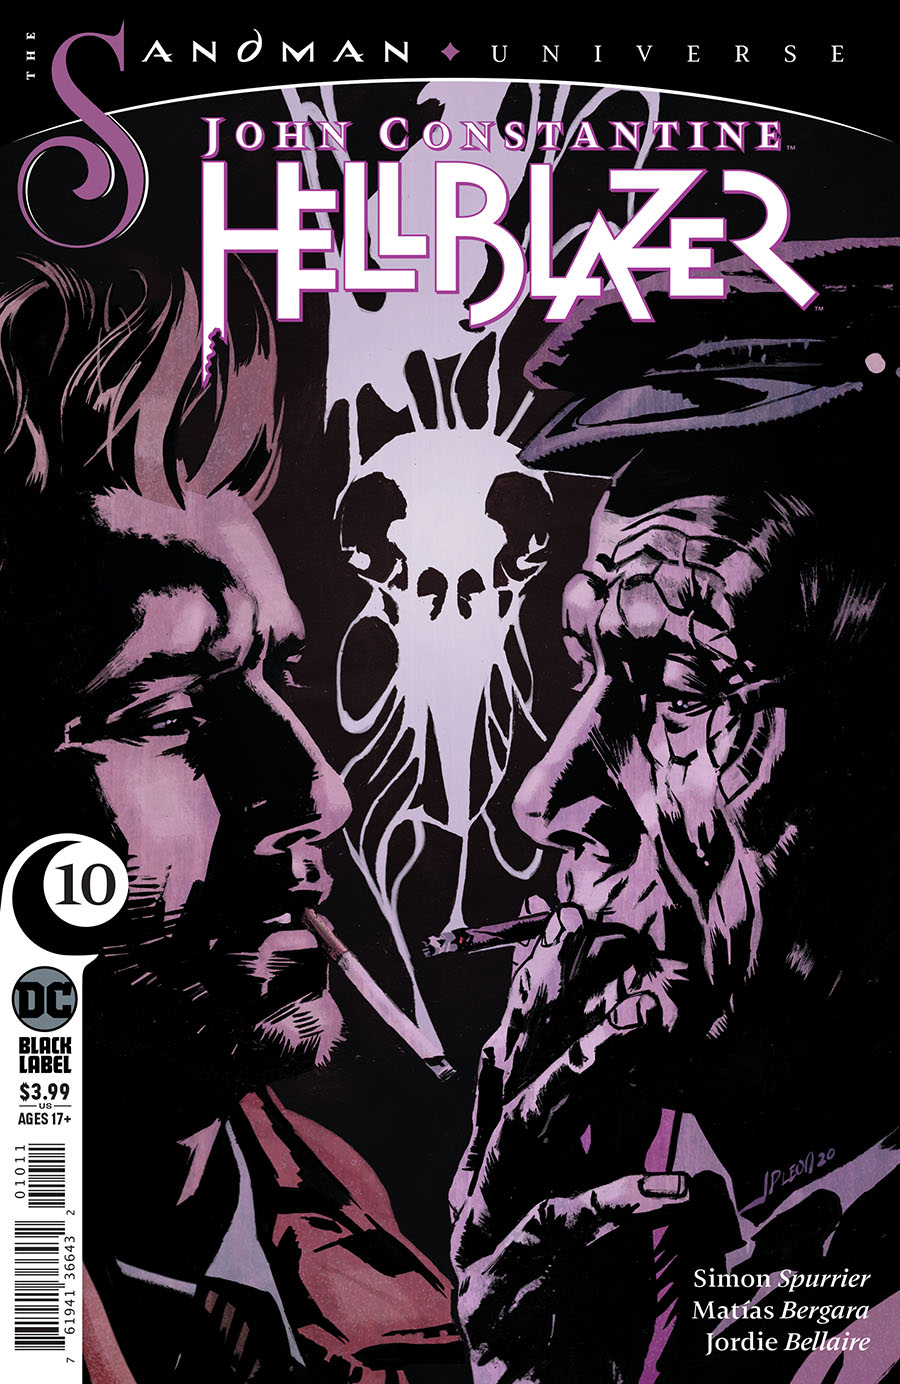 John Constantine Hellblazer #10